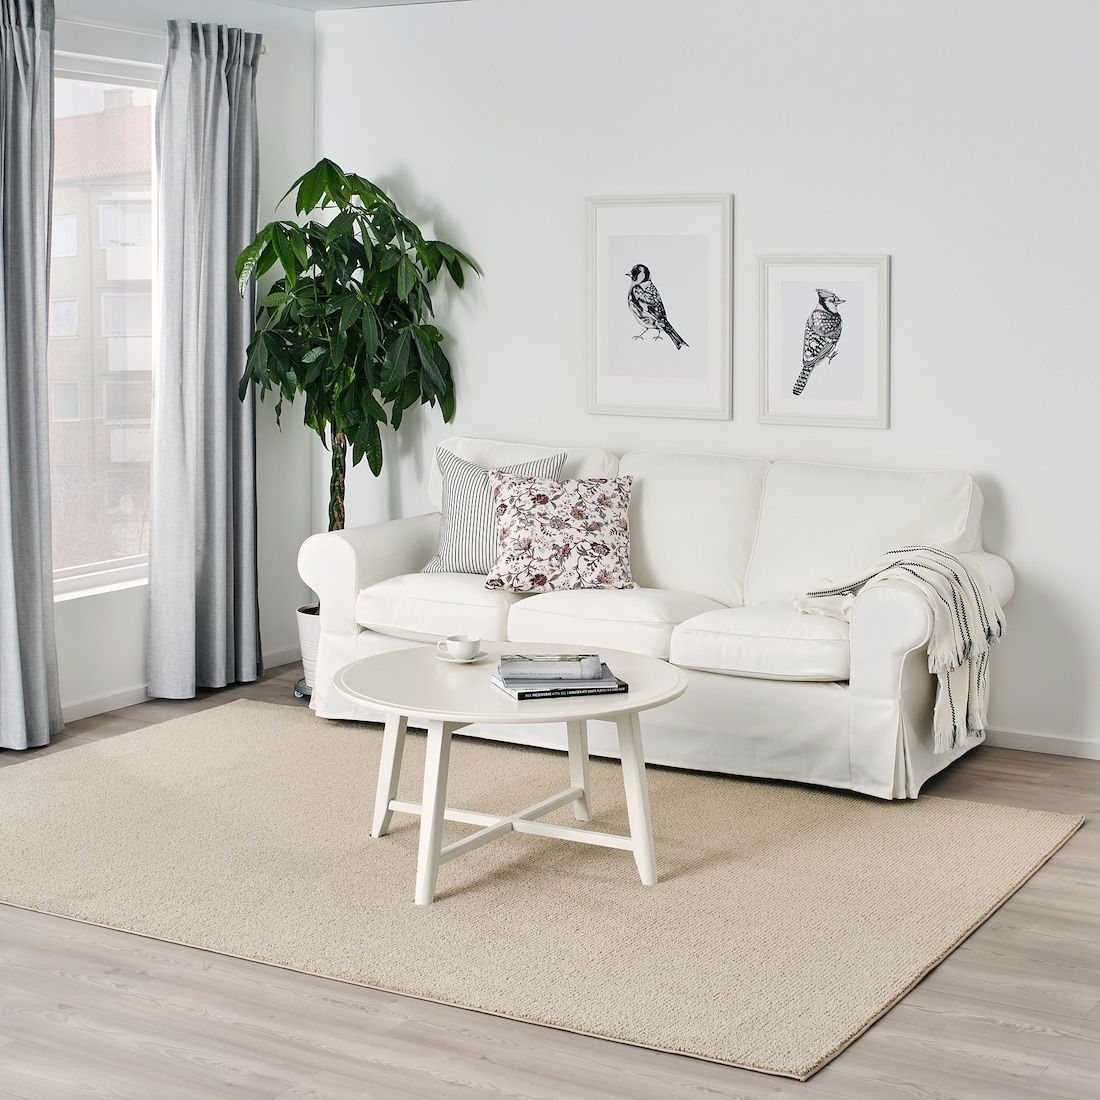 Sporup Rug Low Pile Light Beige 6 7 X9 10 Ikea In 2020 Living Room Flooring Light Beige Ikea #tan #carpet #living #room